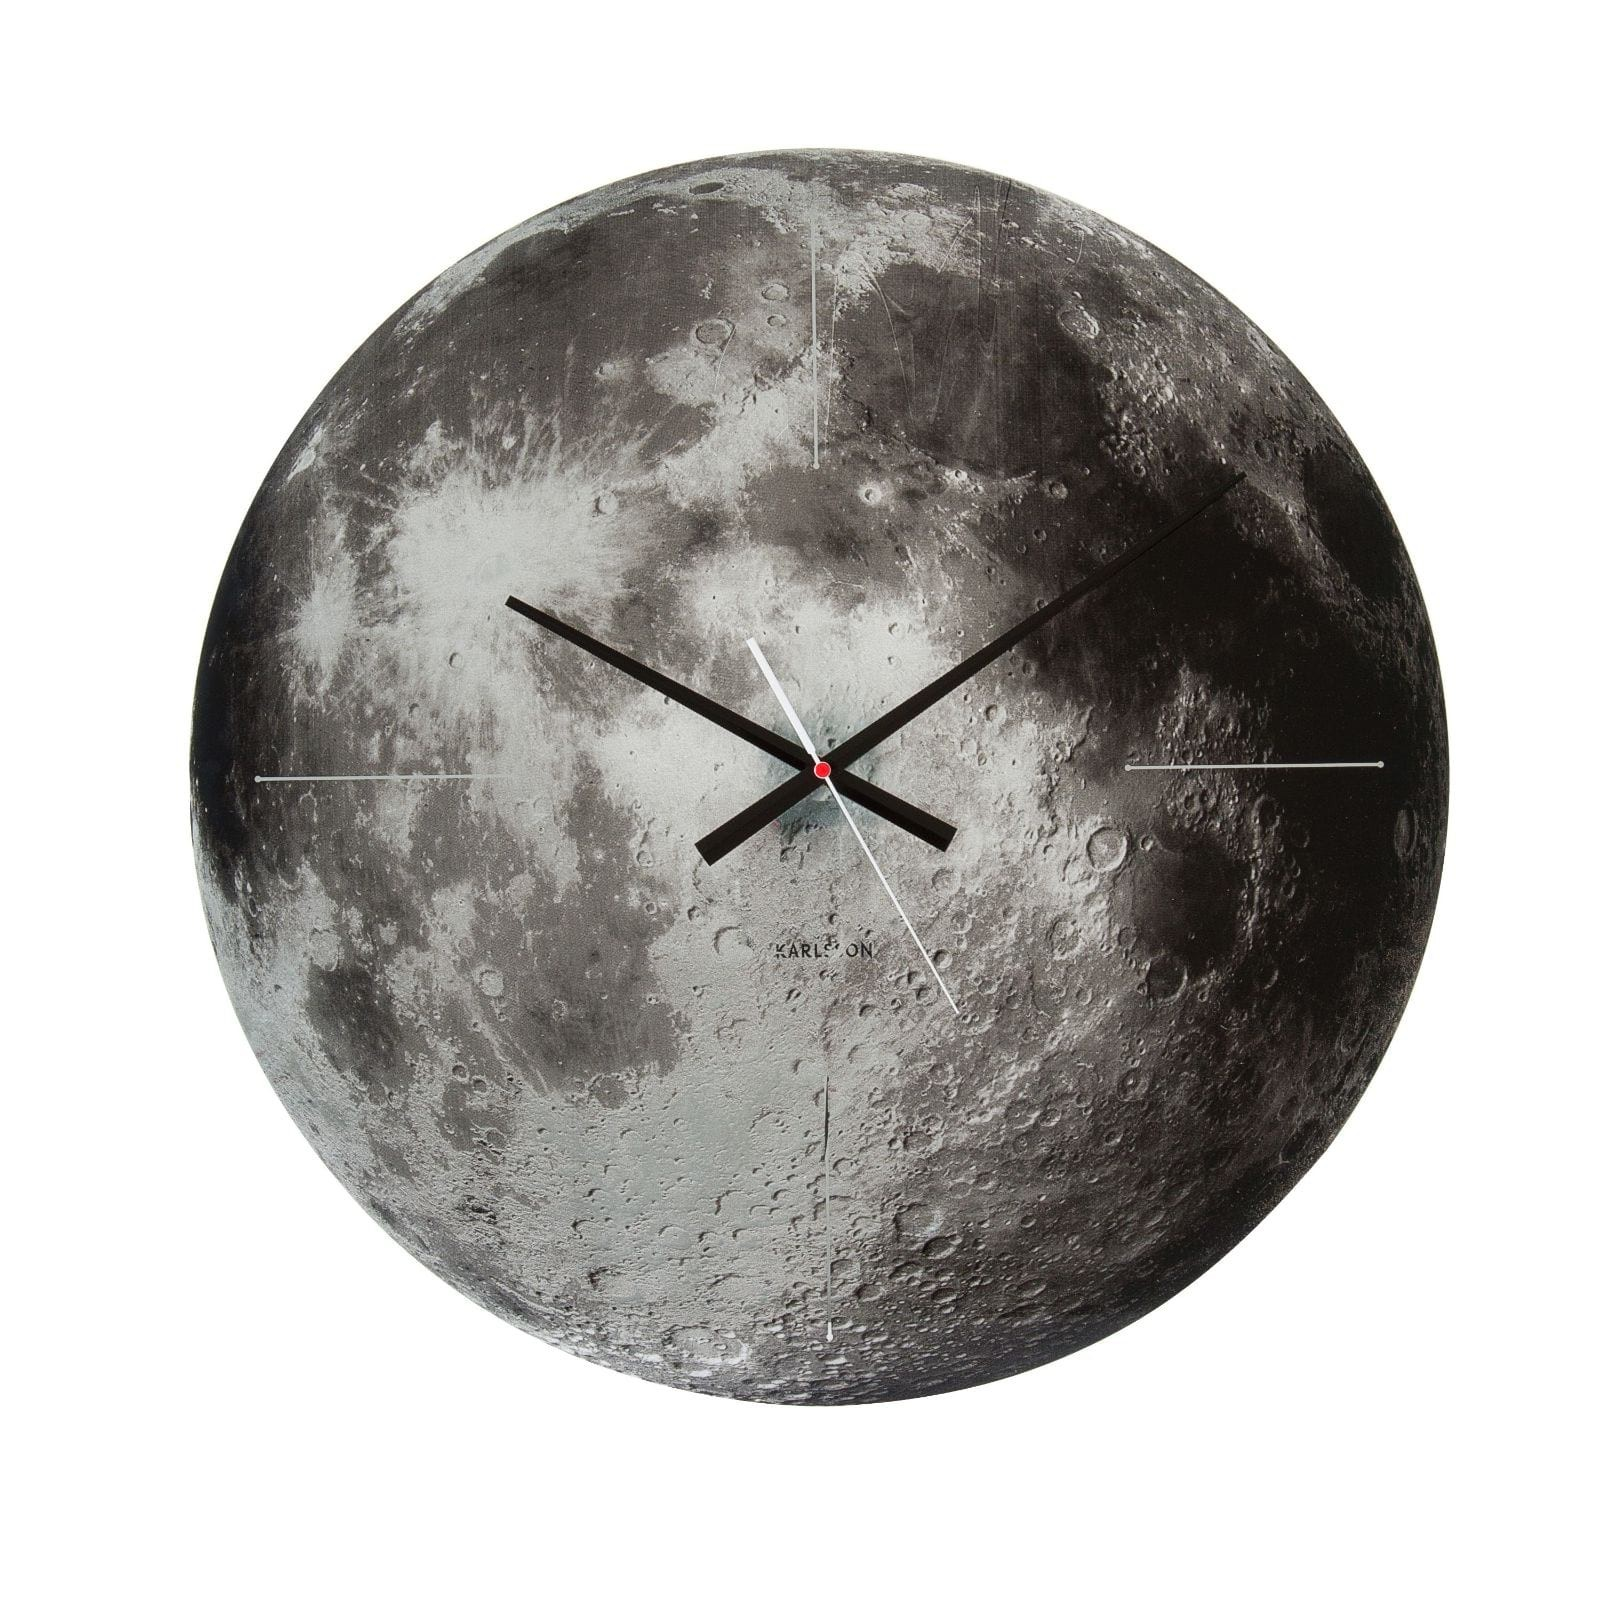 Planet Moon Wall Clock (Mirrored Glass) - Karlsson